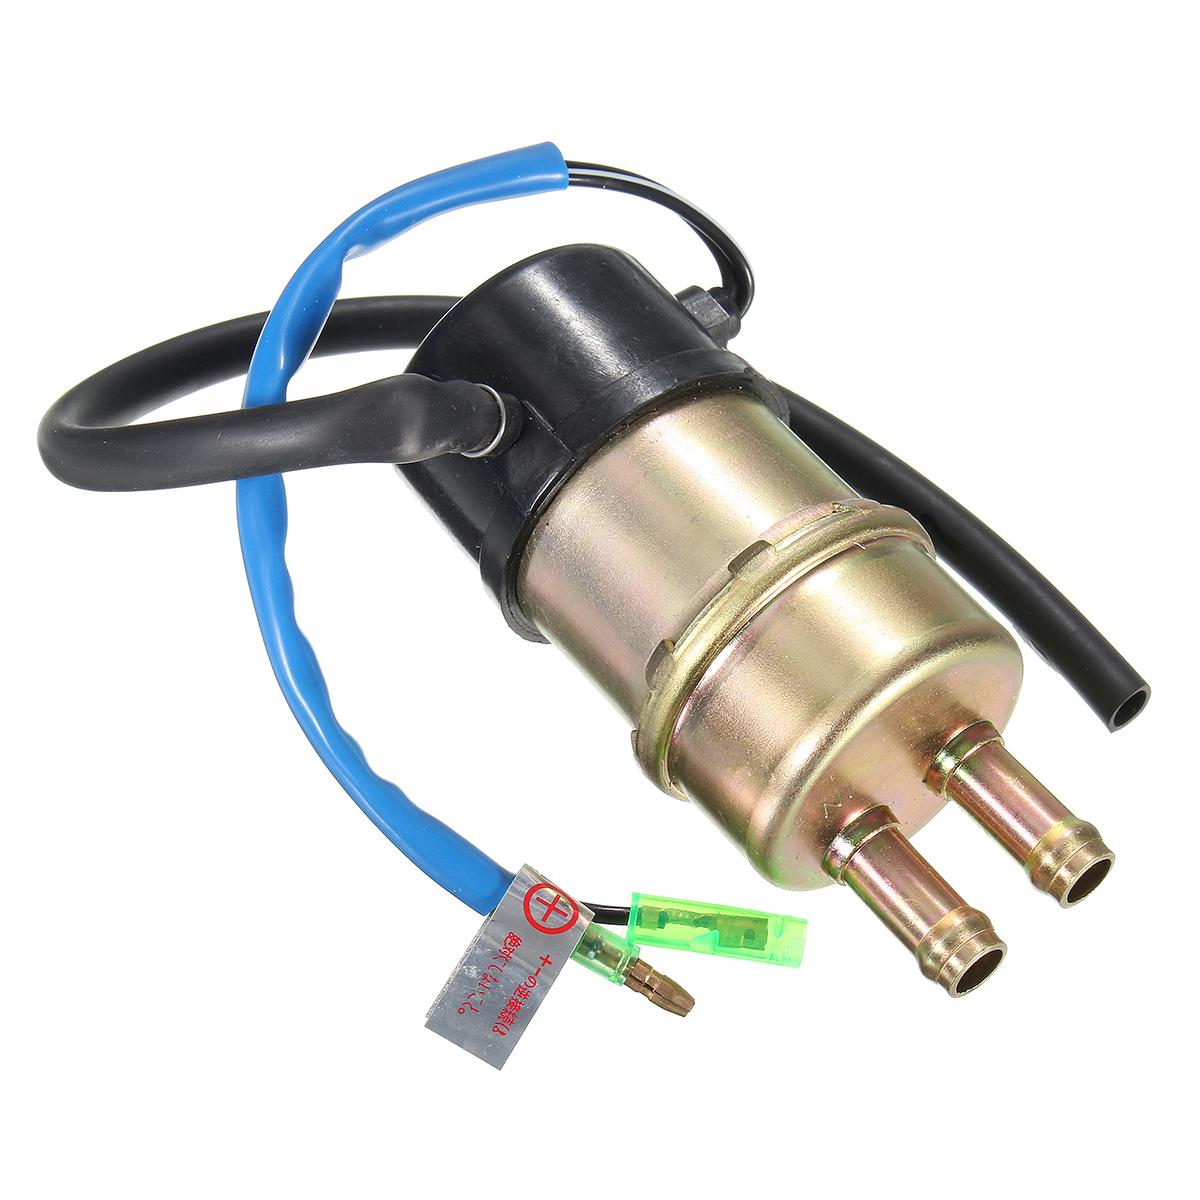 Kawasaki Mule 3010 Fuel Filter Fuel Pump With Filter 49040 1055 For Kawasaki Mule 1000